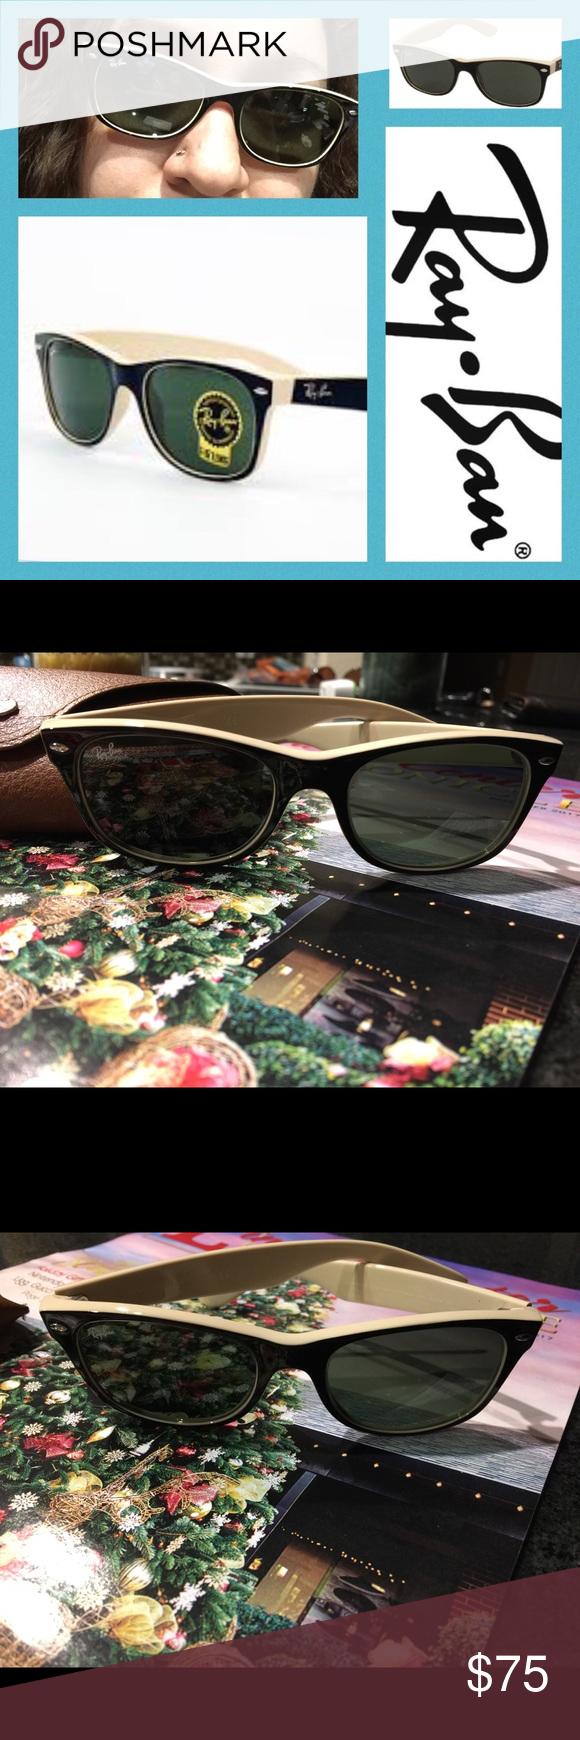 ebeaaff92f2f2 NWOT Ray-Ban Wayfarer Mod Two-Tone Sunglasses Retro classic with an Indie  update